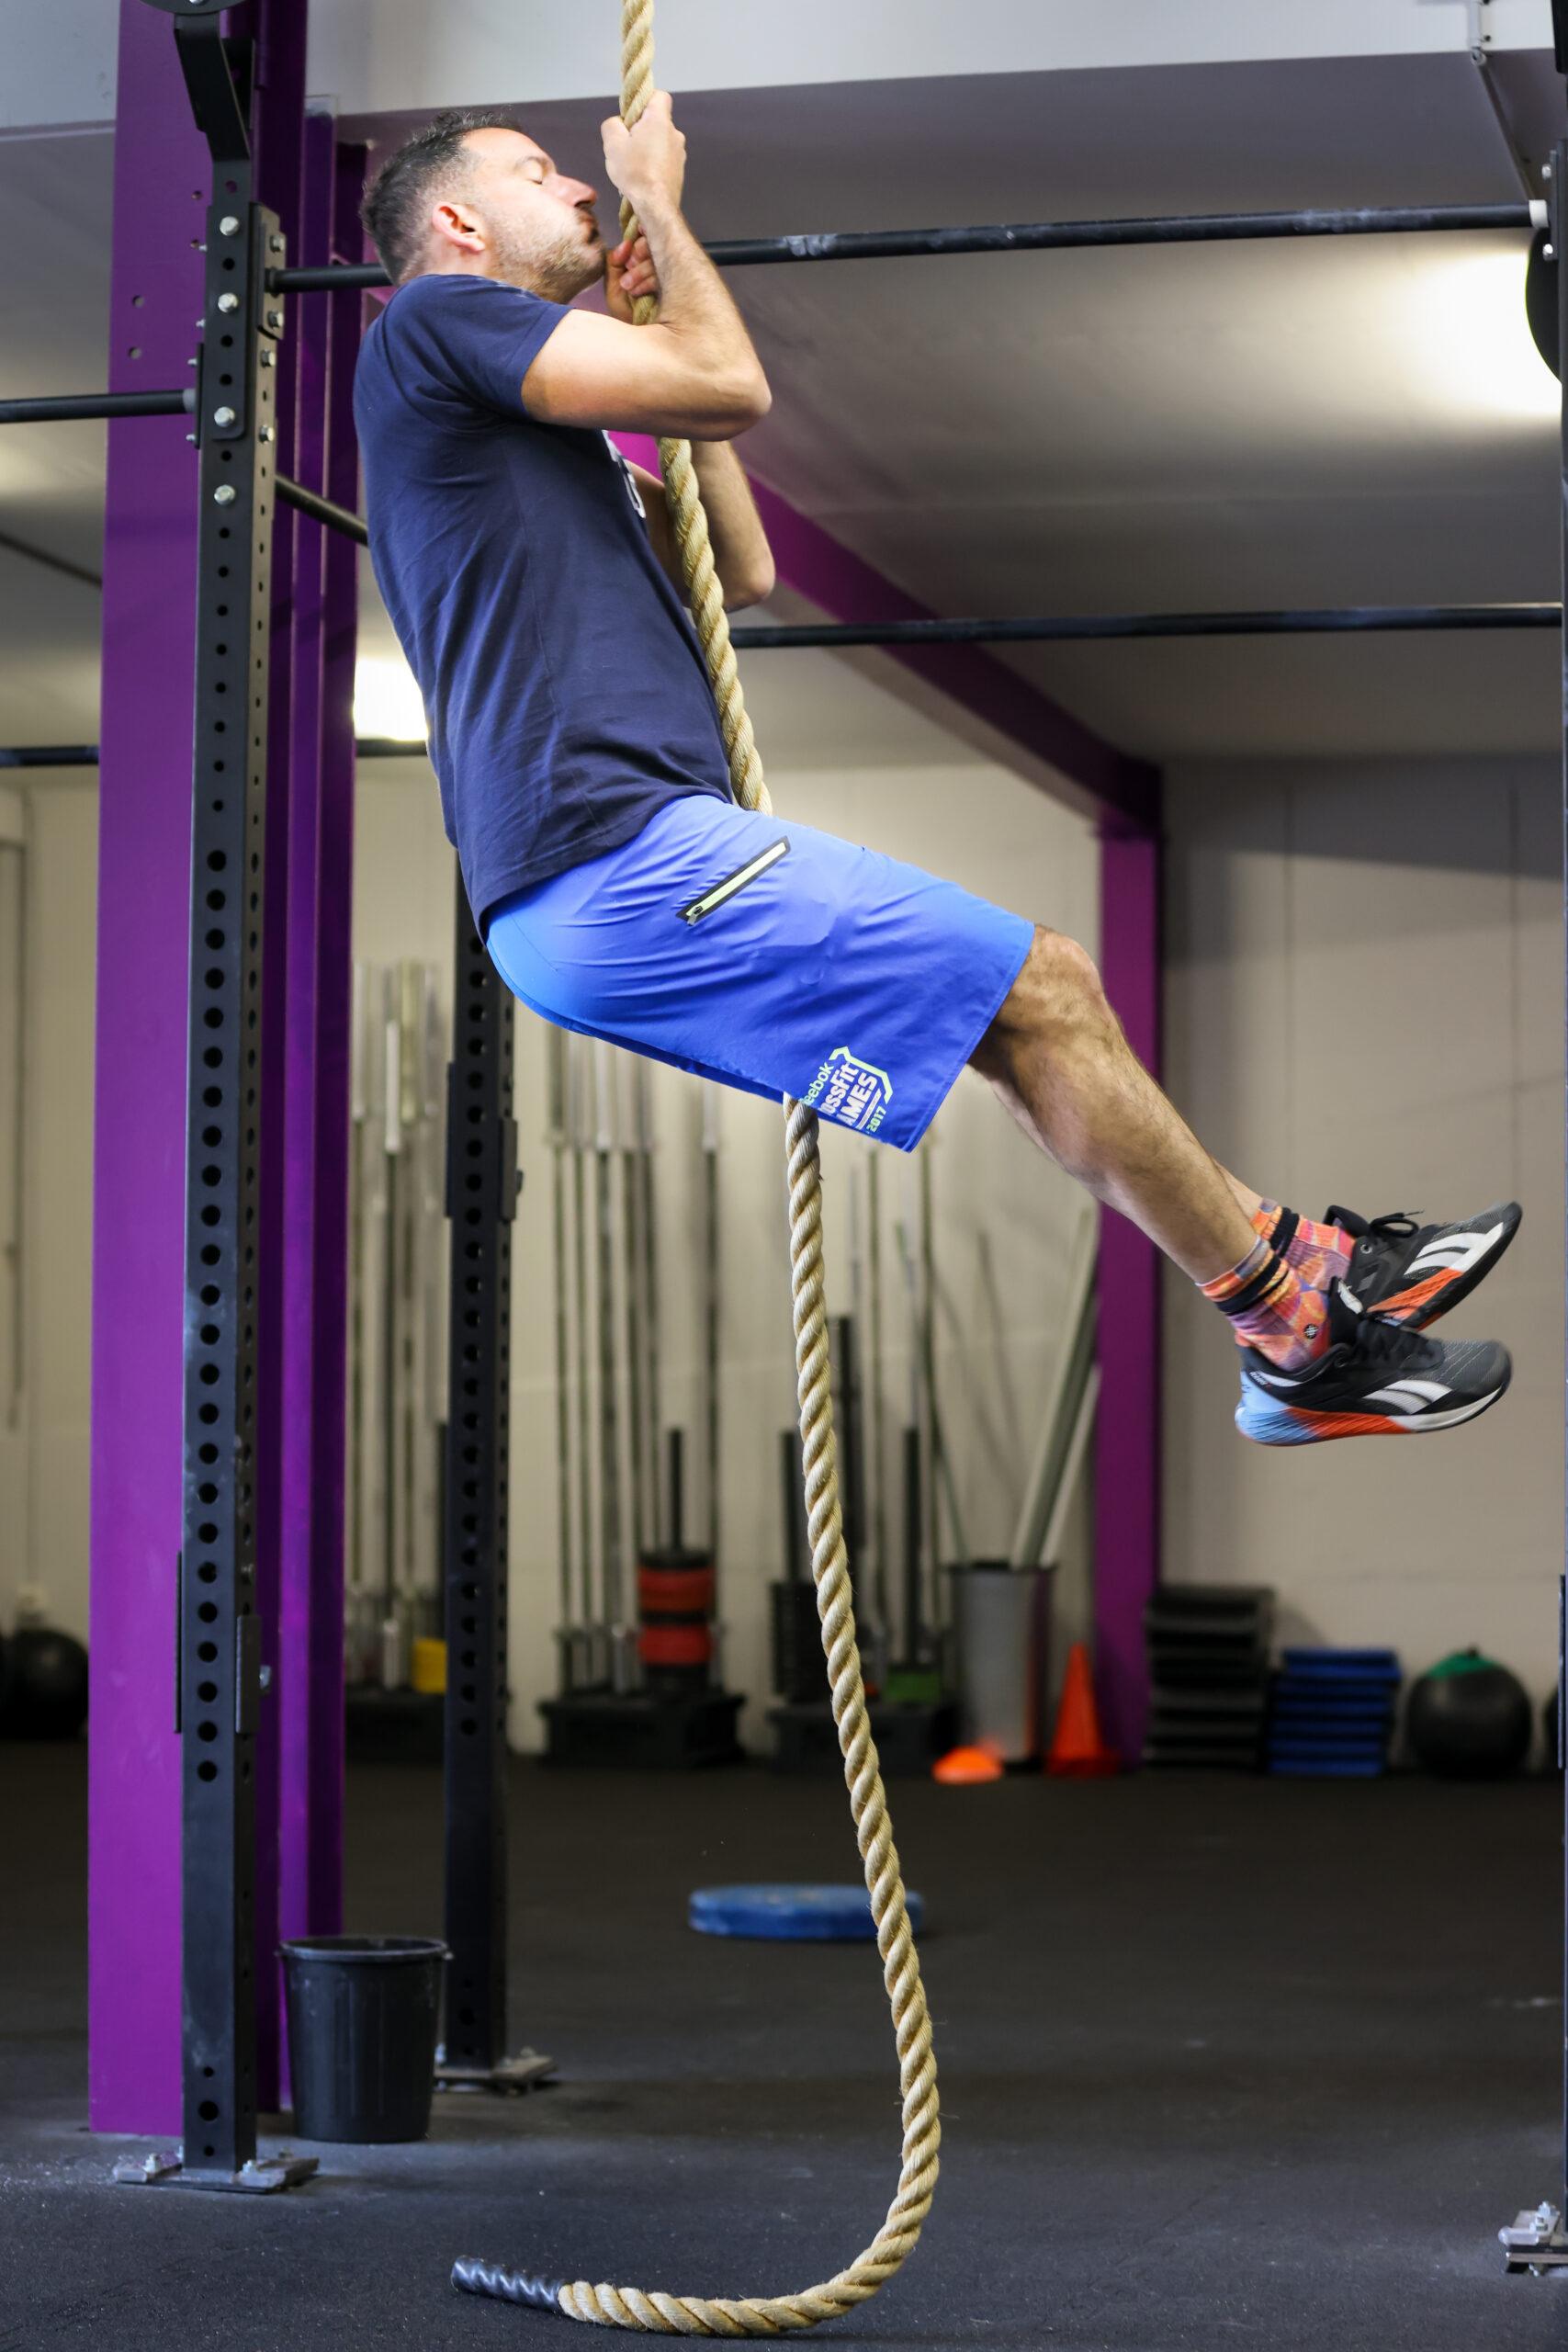 Sweat Class Funktionelles Fitnesstraining Uetikon am See